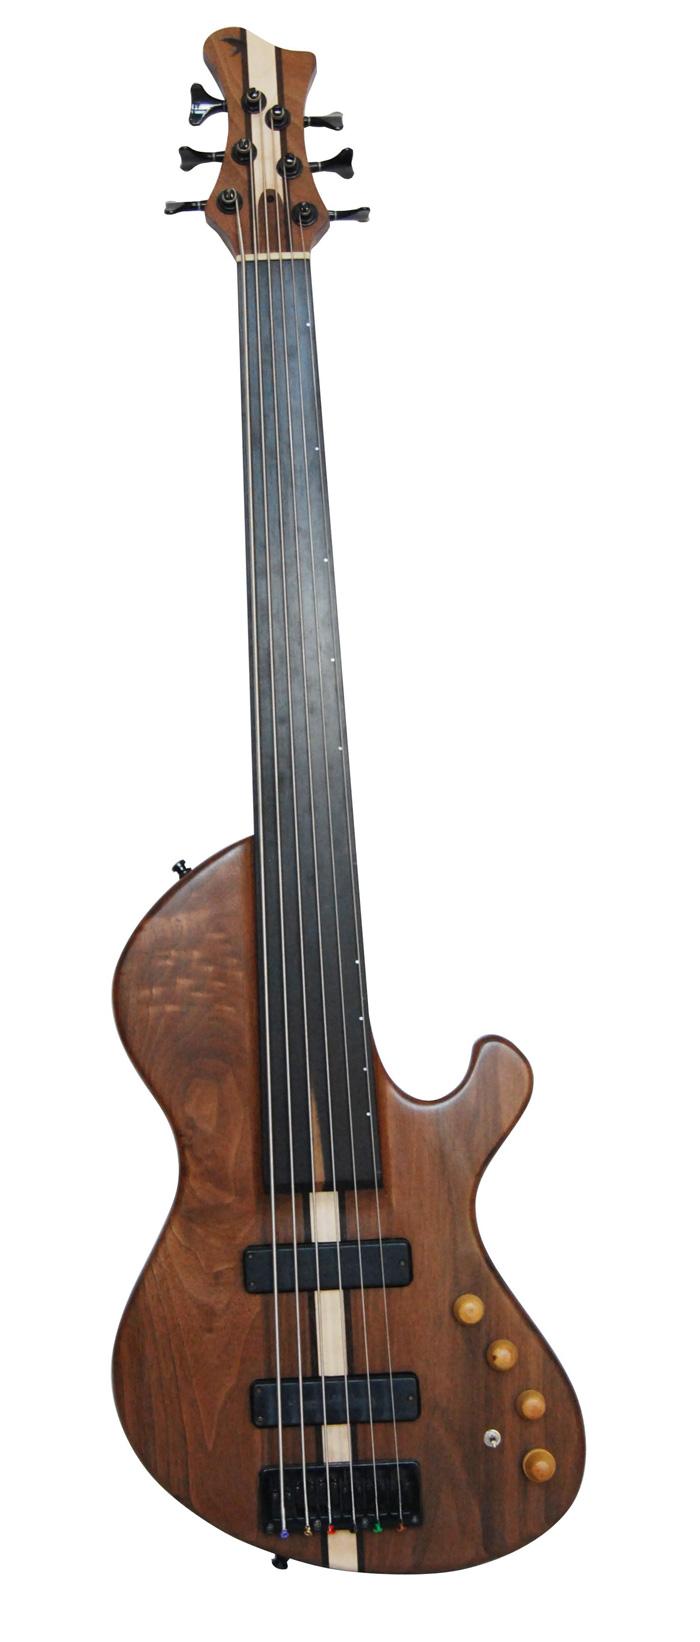 boutique guitare laguitare.com : vente guitare Gaia Guitares La Fée